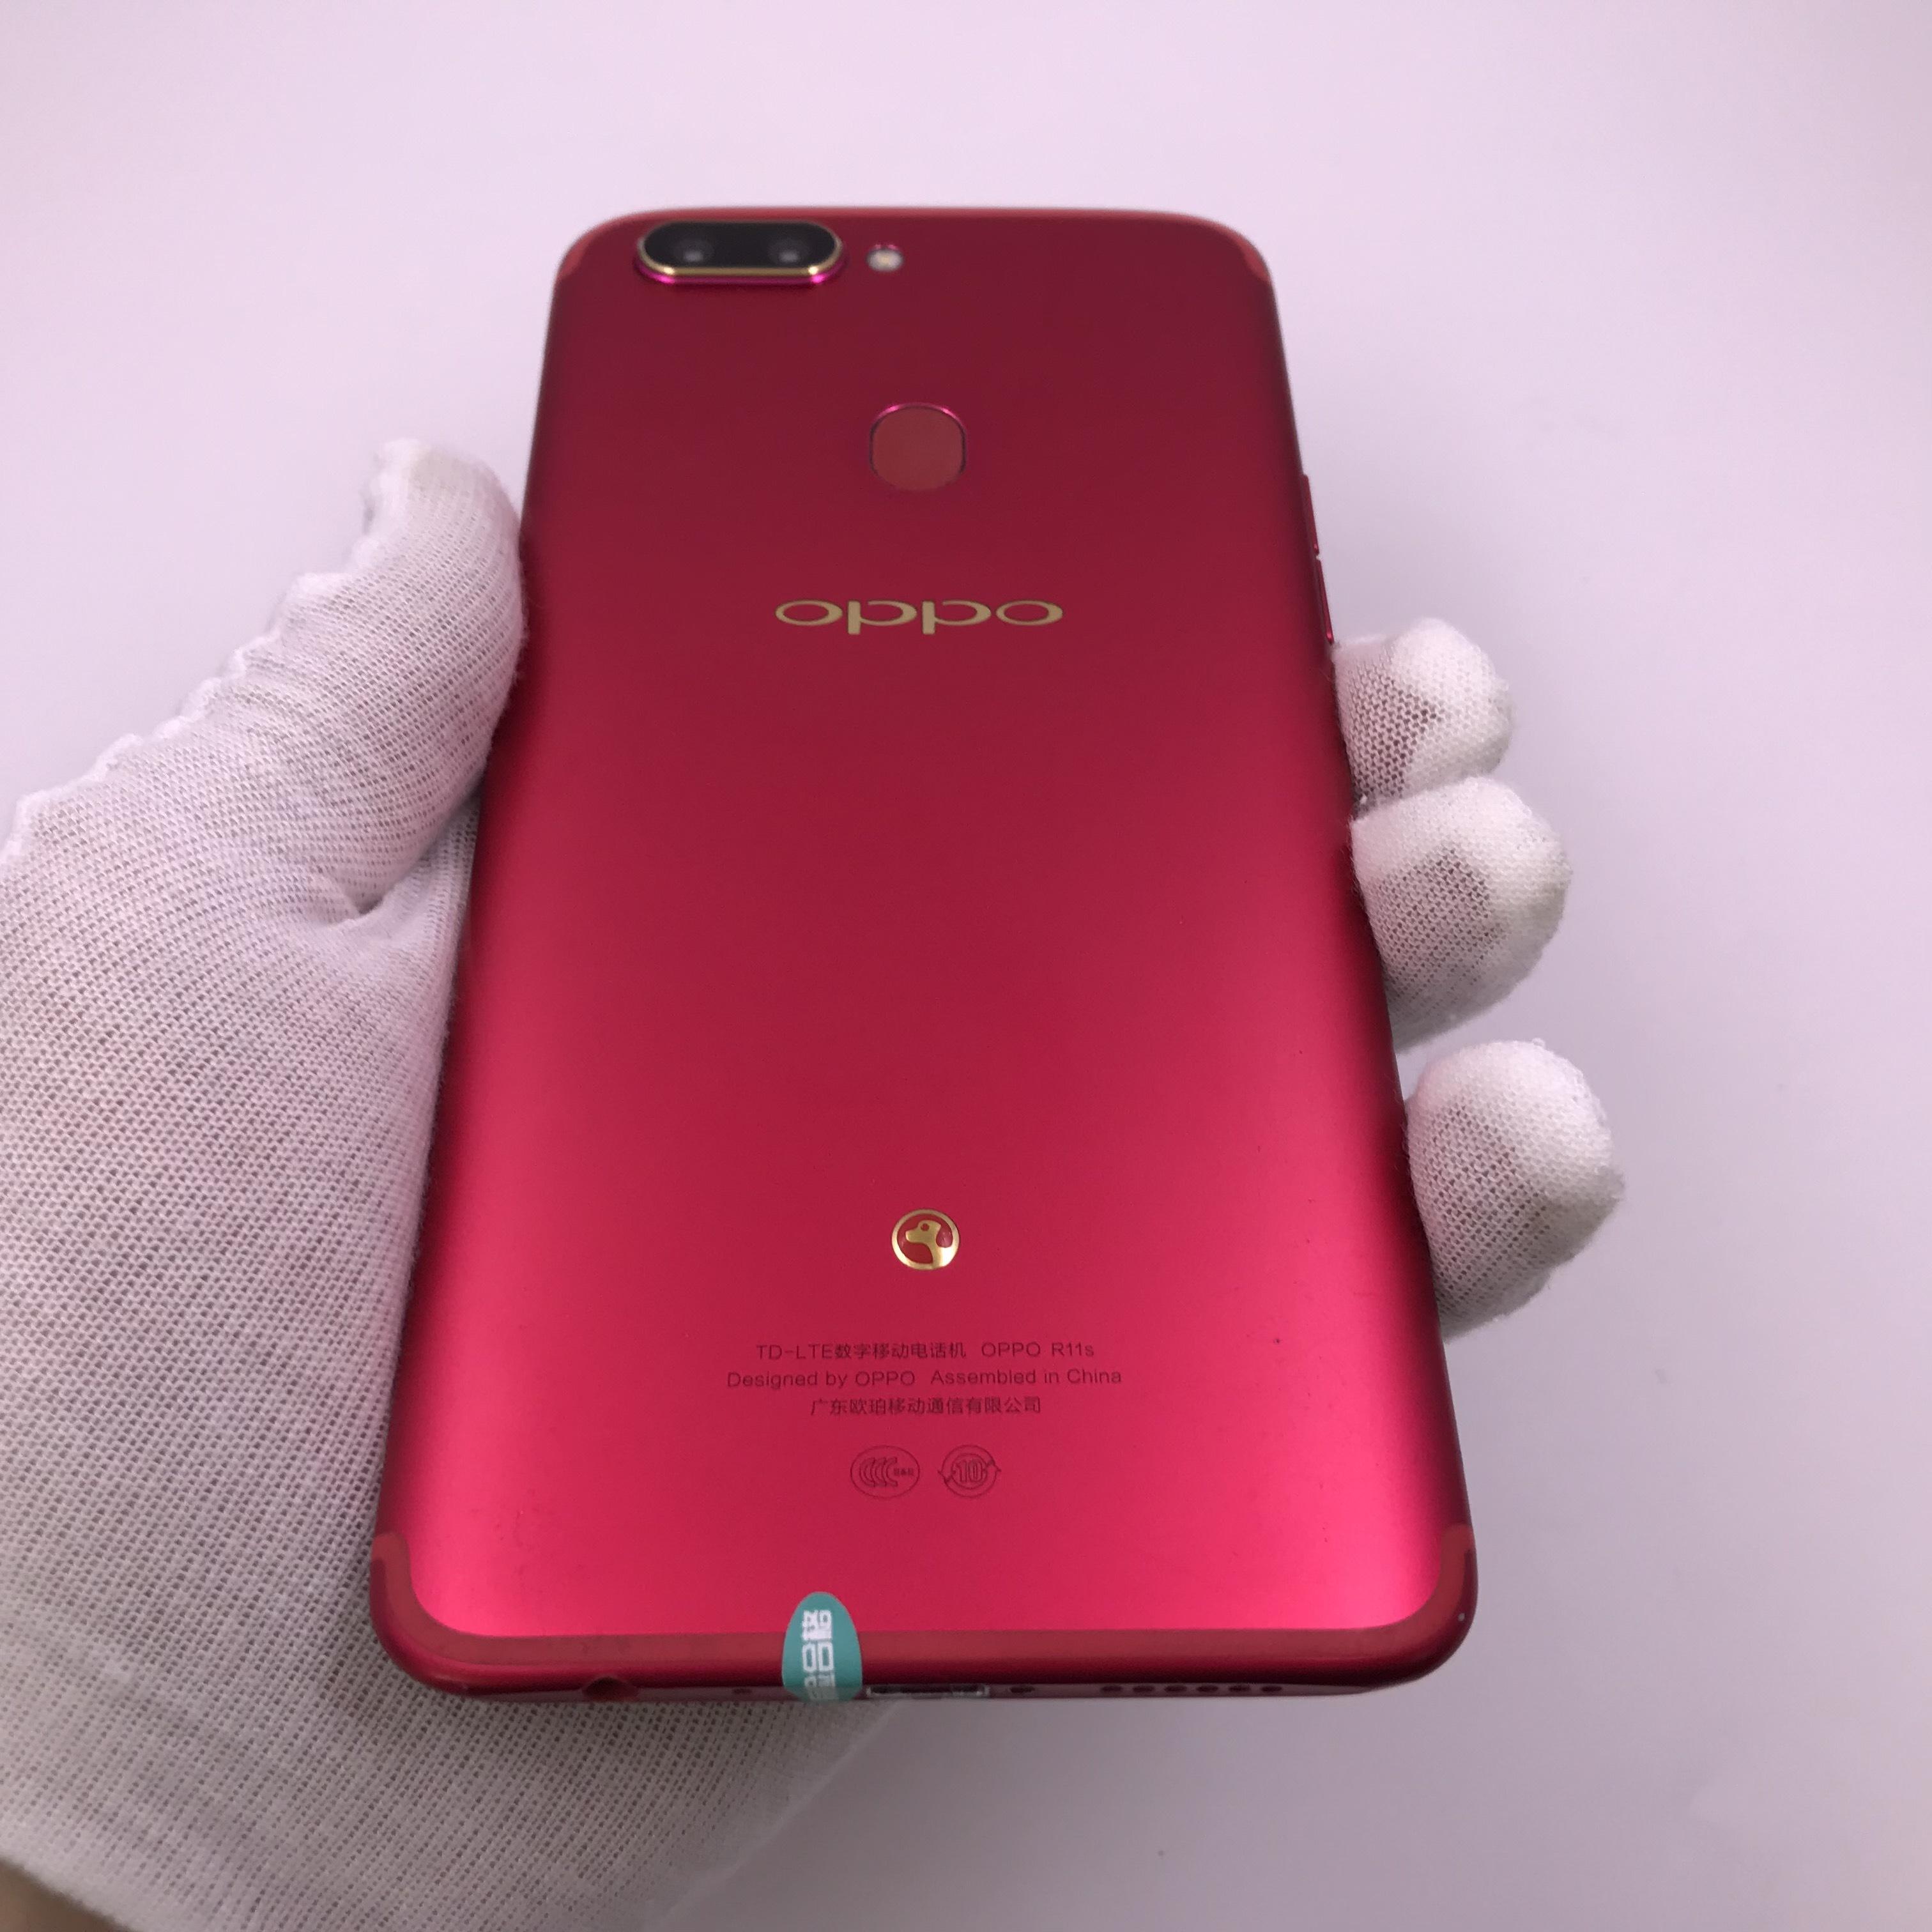 oppo【R11s】4G全网通 红色 64G 国行 7成新